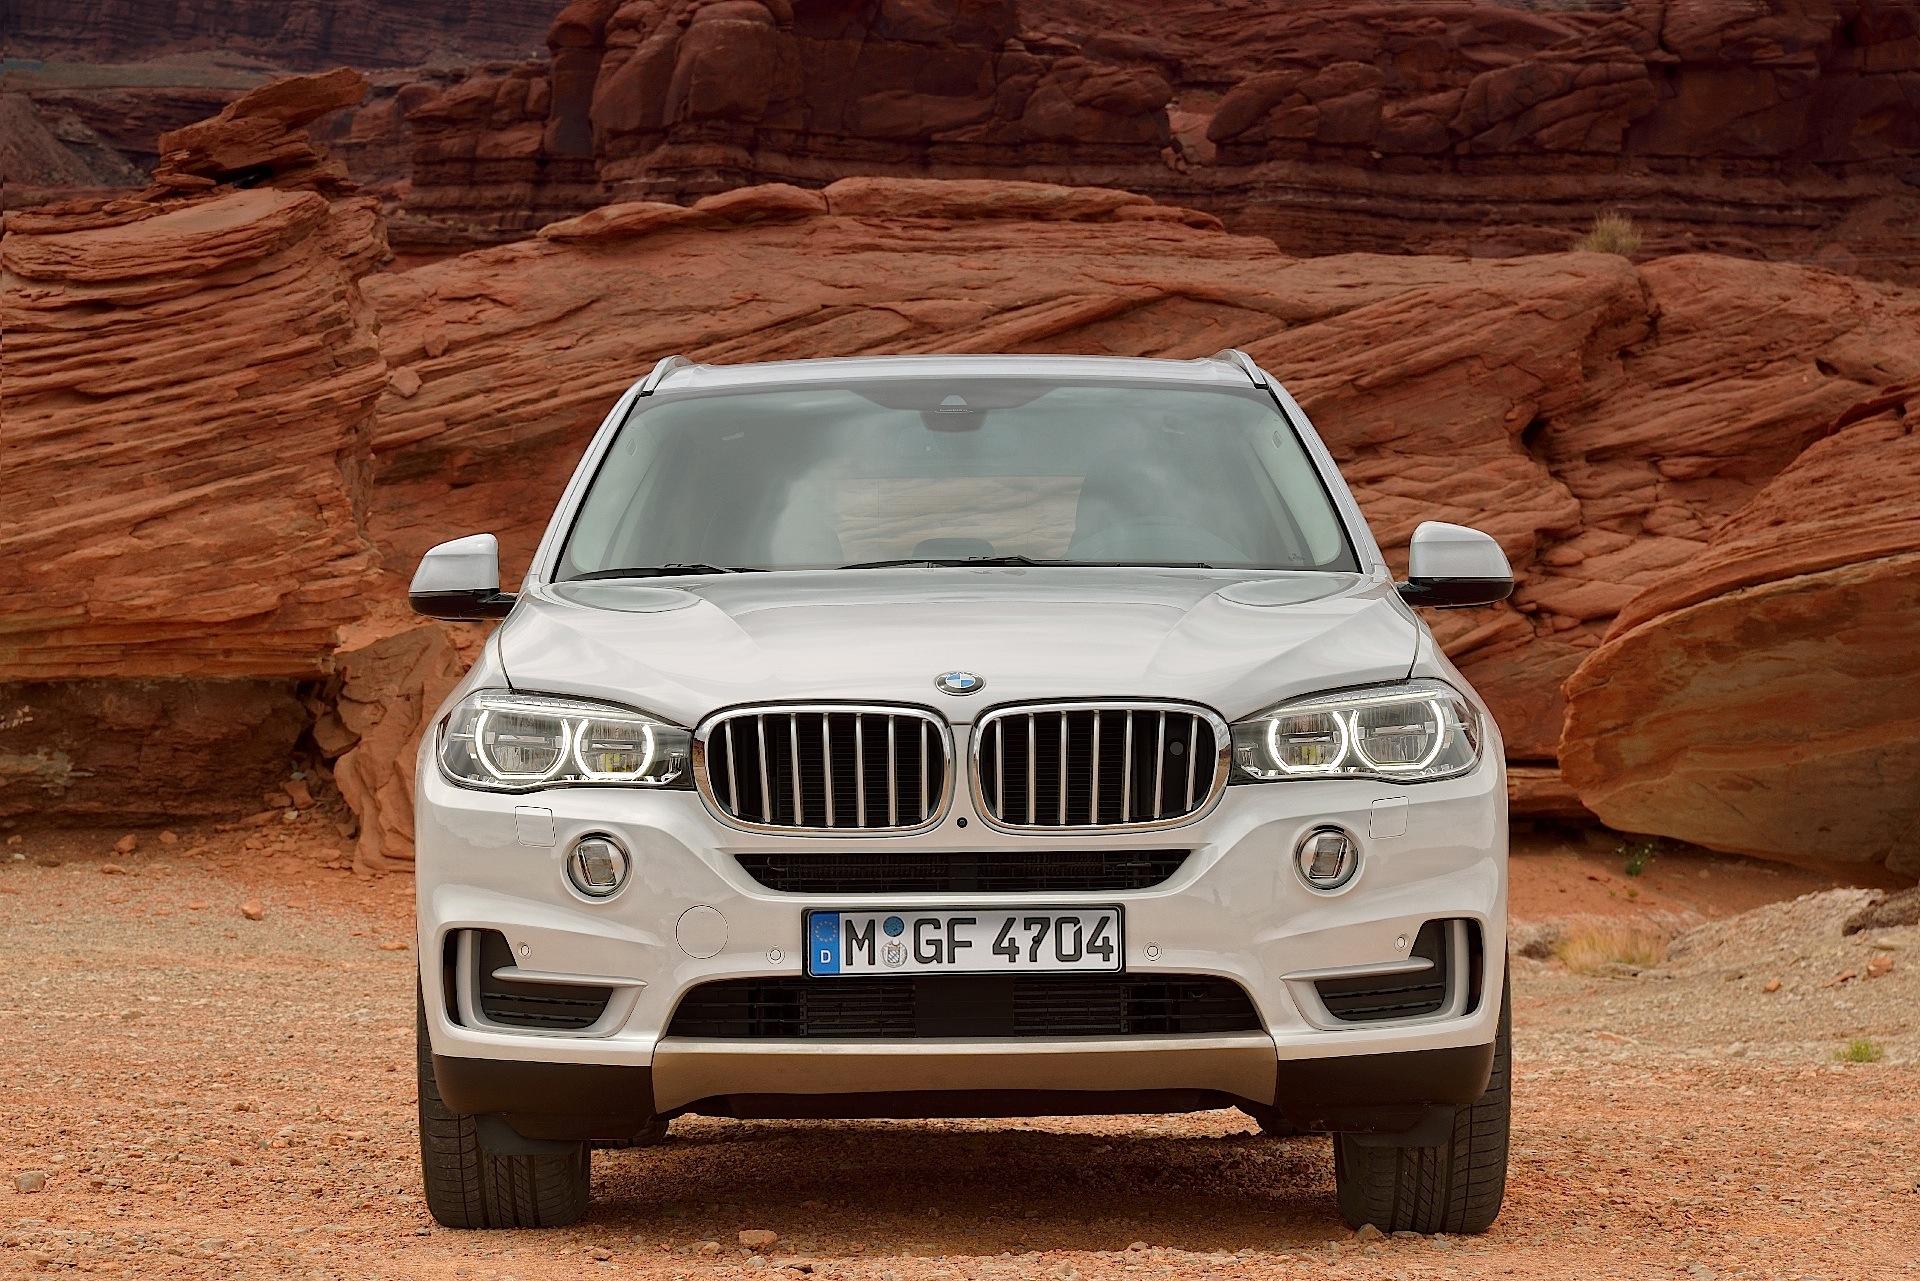 BMW X5 (F15) - 2014, 2015, 2016 - autoevolution